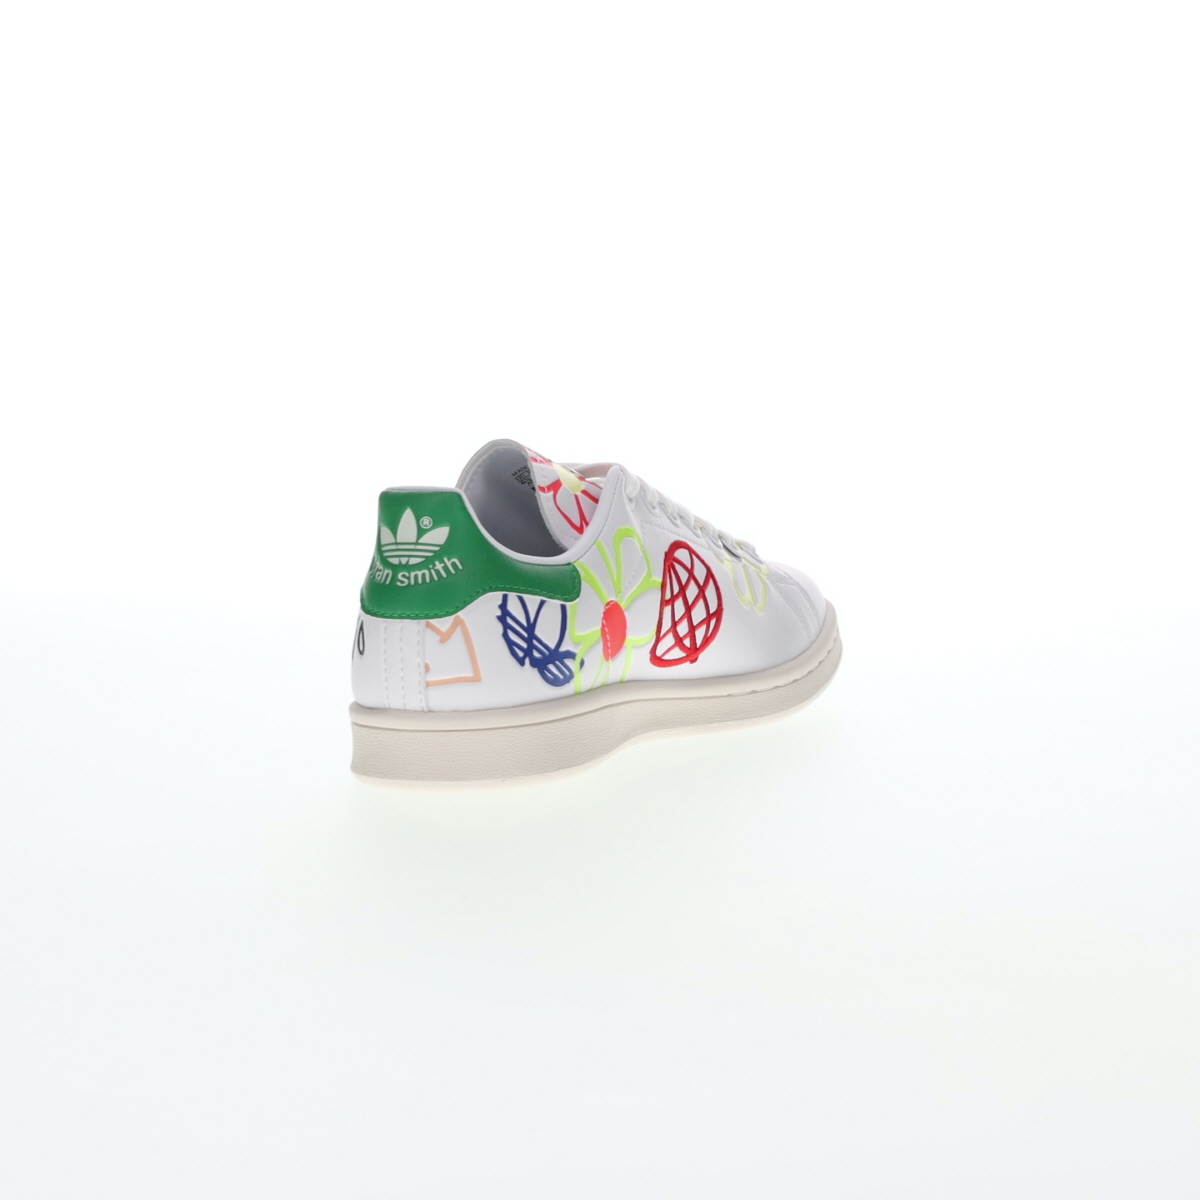 adidas kids samba soccer shoes for adults sale